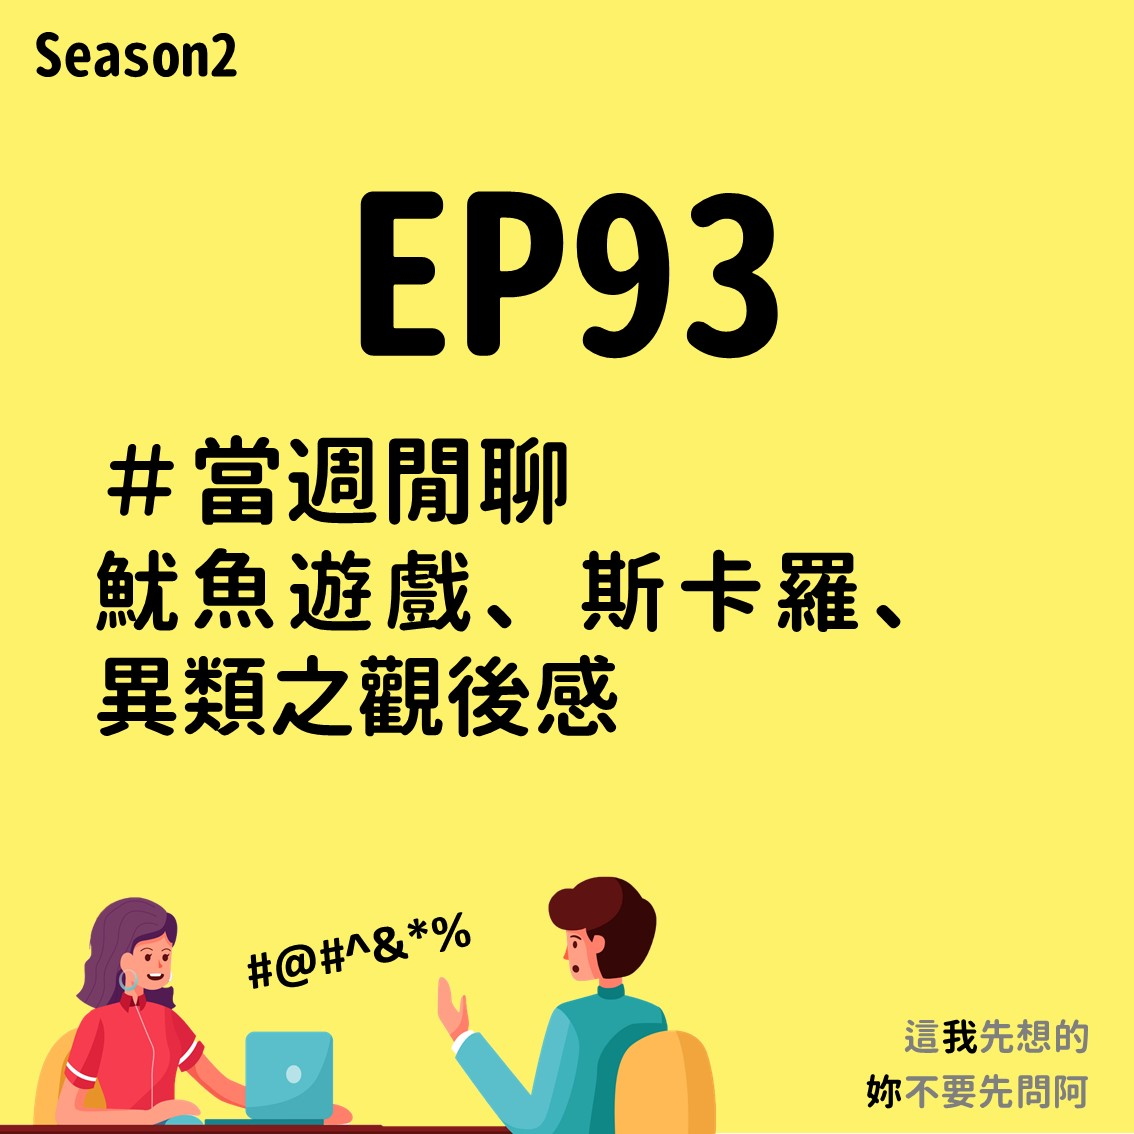 EP93 當週閒聊|魷魚遊戲、斯卡羅、異類之觀後感